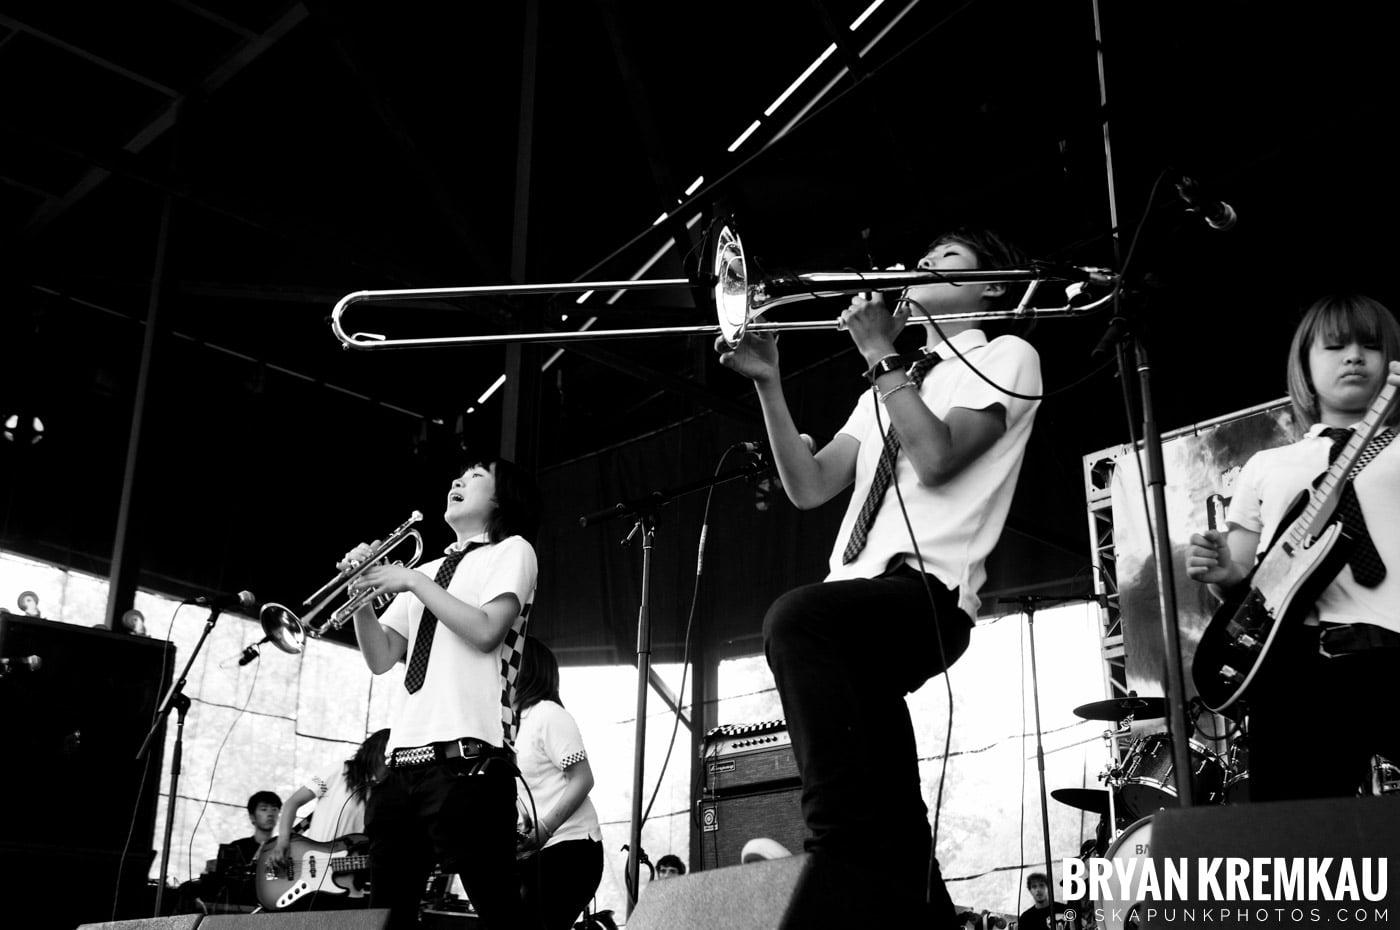 Oreskaband @ Warped Tour 08, Scranton PA - 7.27.08 (1)